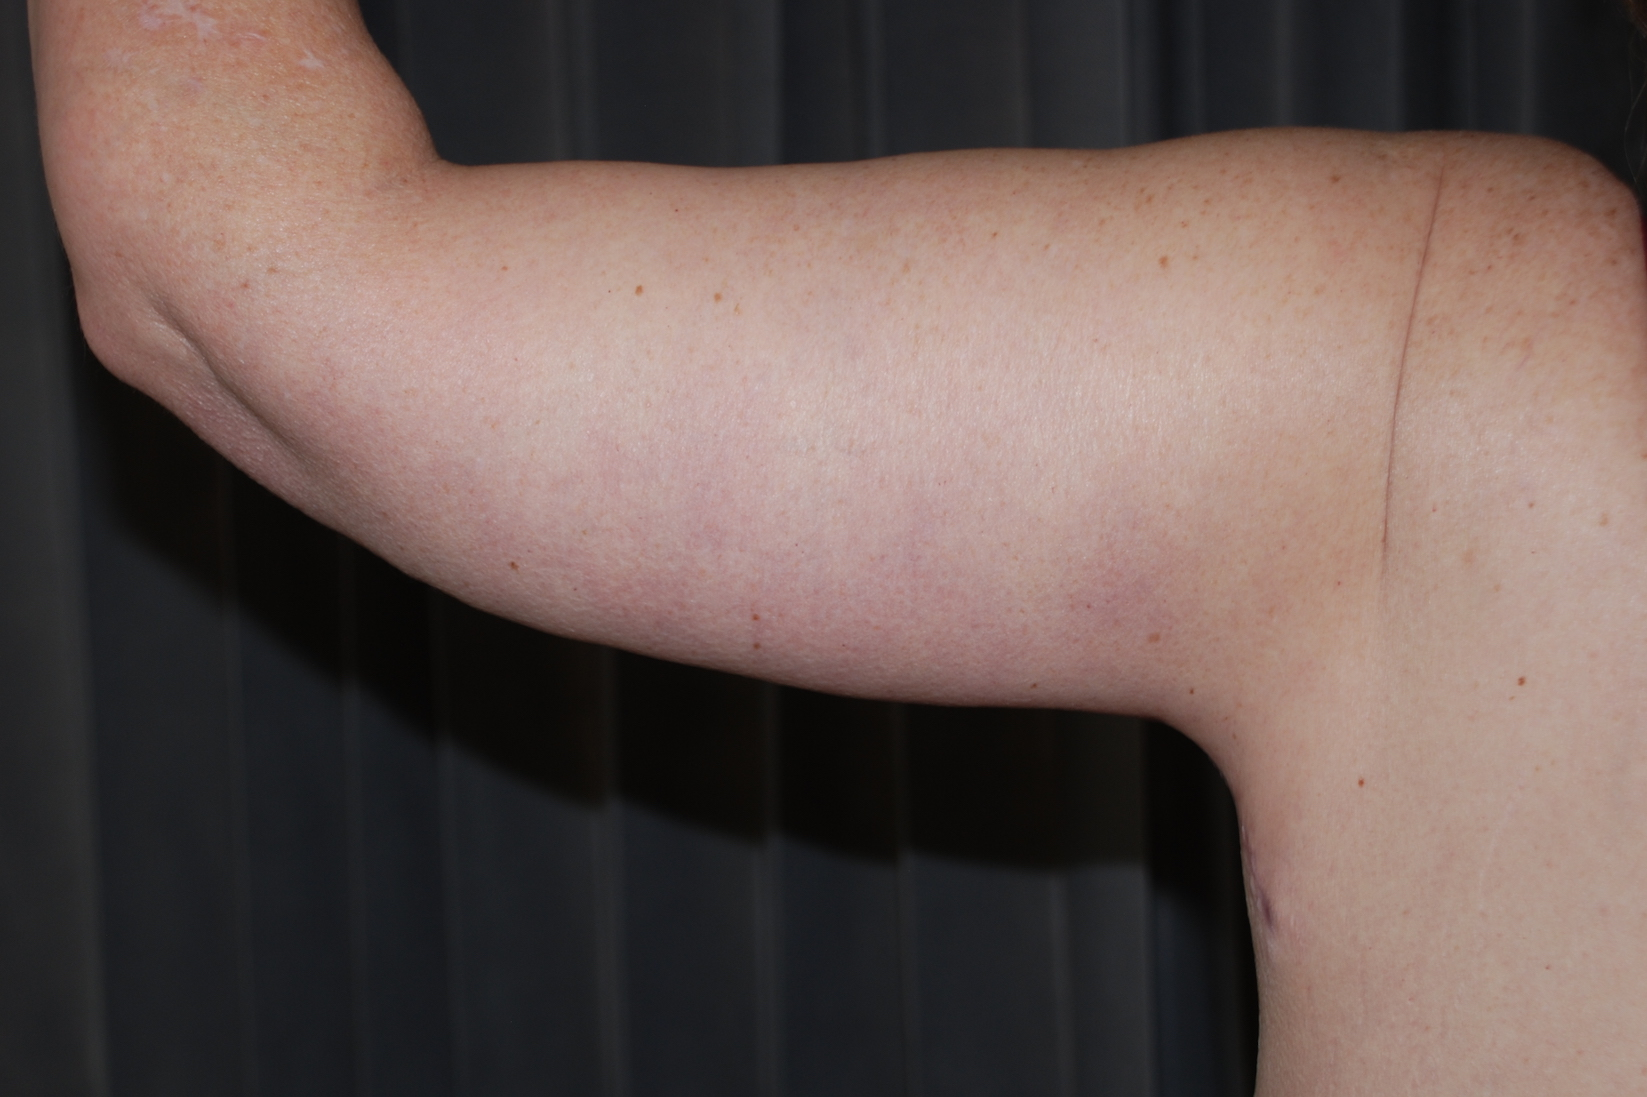 brachioplasty cosmetic harley weightloss